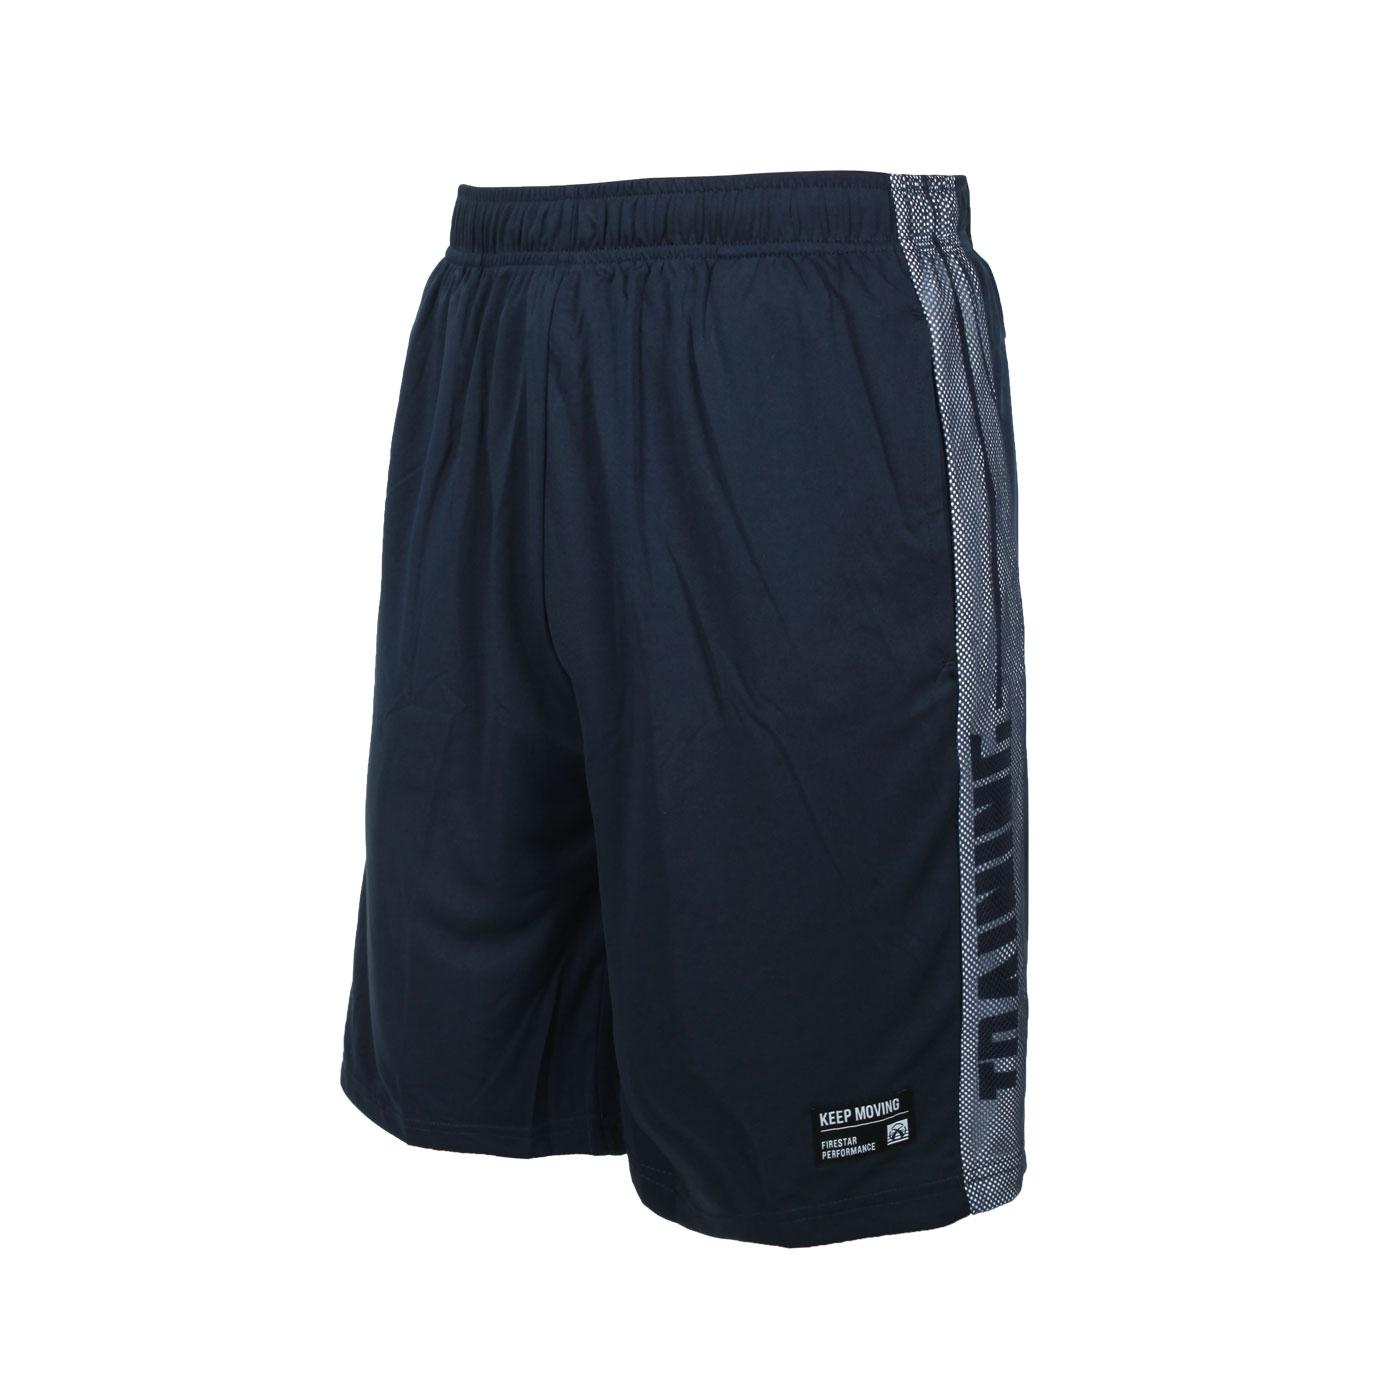 FIRESTAR 男吸排訓練籃球褲 B1702-93